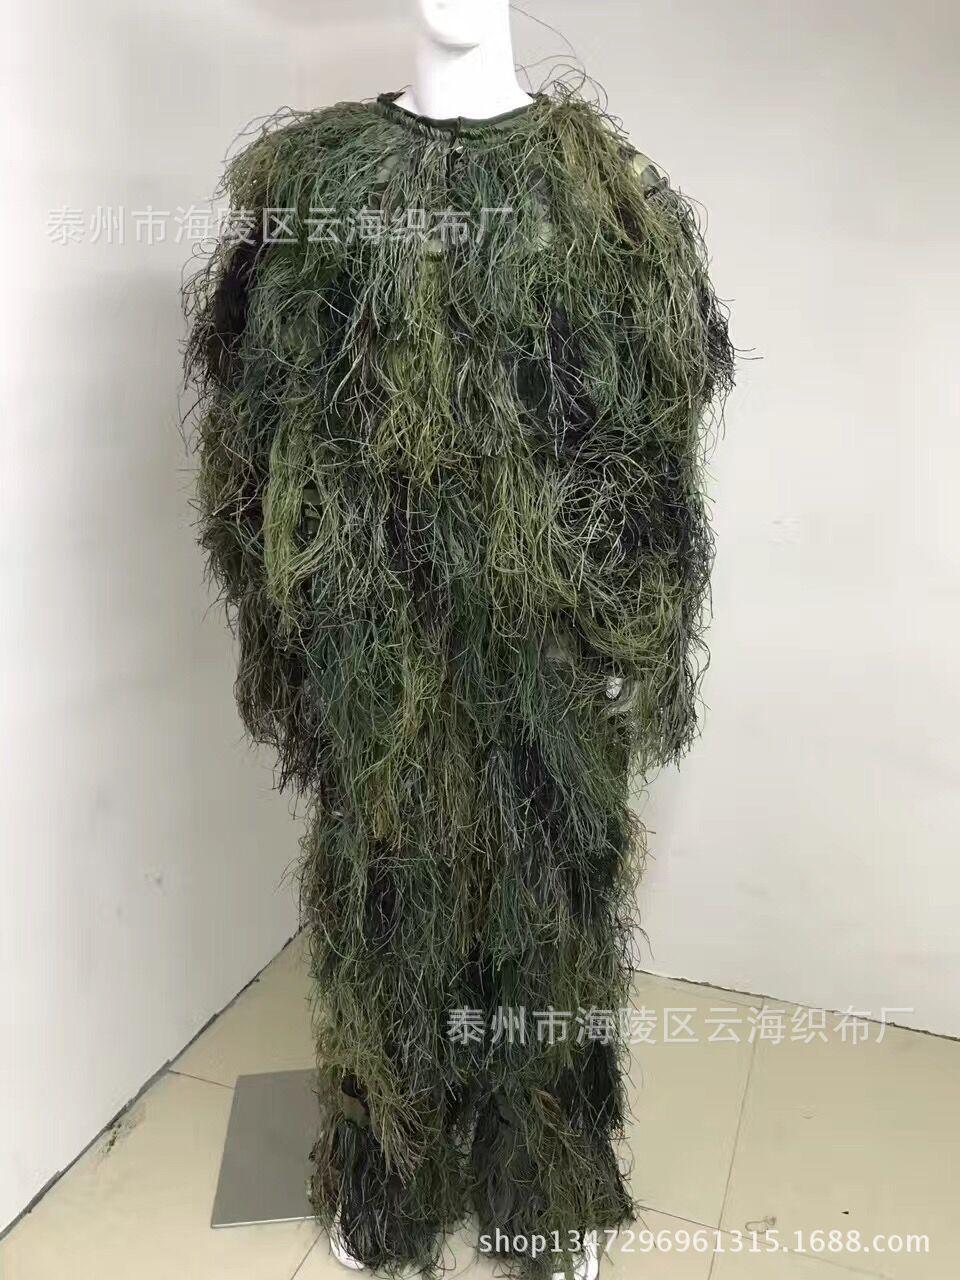 Jungle Filament Camouflage Green Velcro Clothes Ghillie Suit Camouflage CS Costume Camouflage